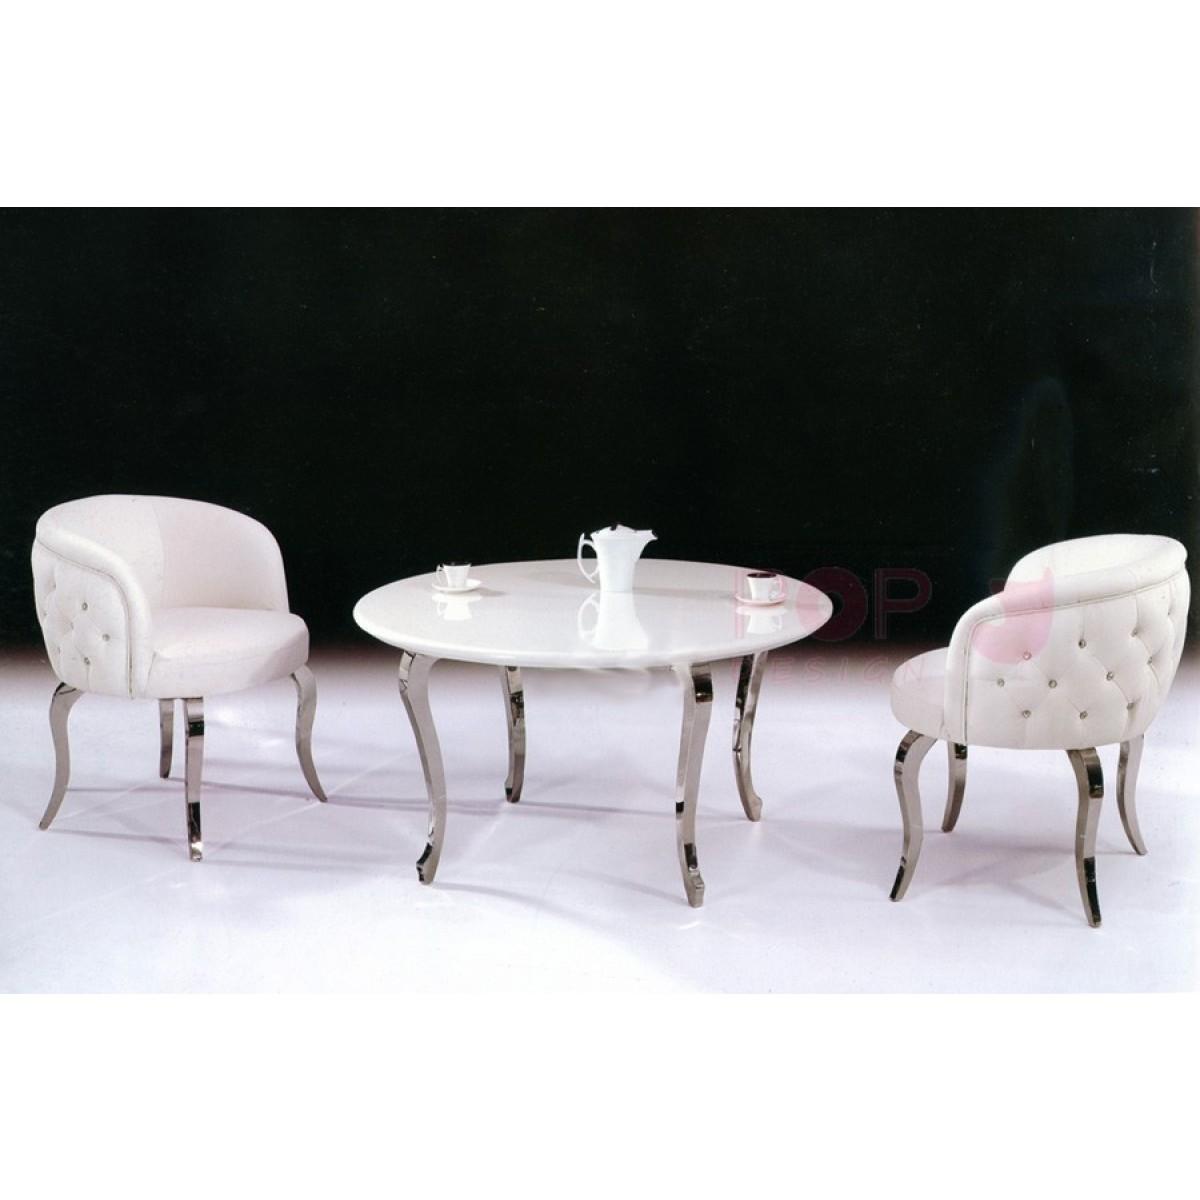 Table basse en marbre et inox boudoir for Table basse marbre design